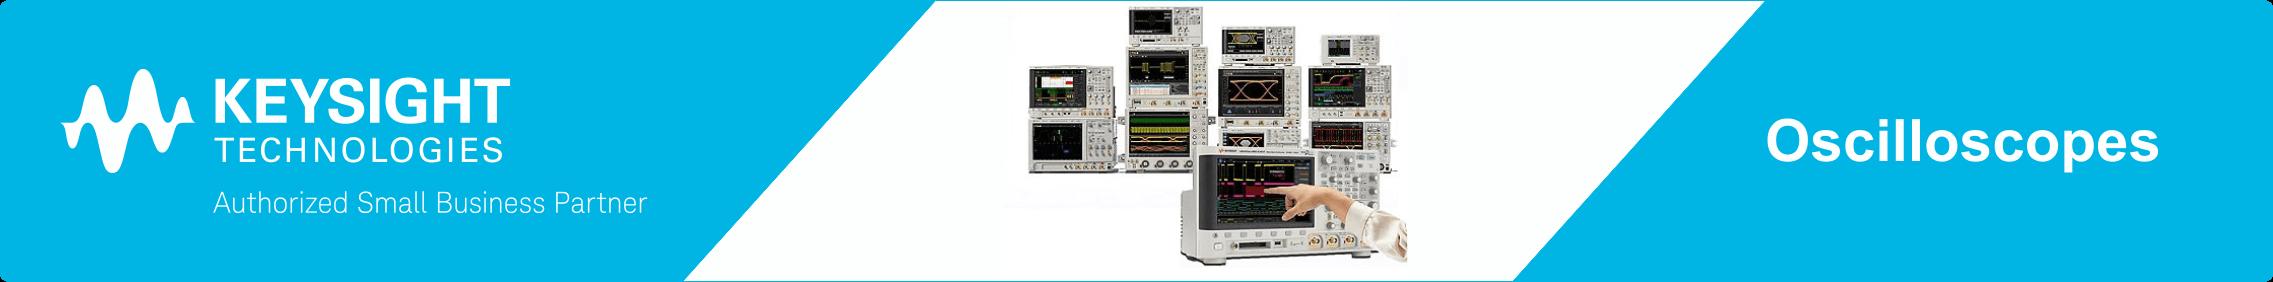 Keysight Oscilloscopes web banner